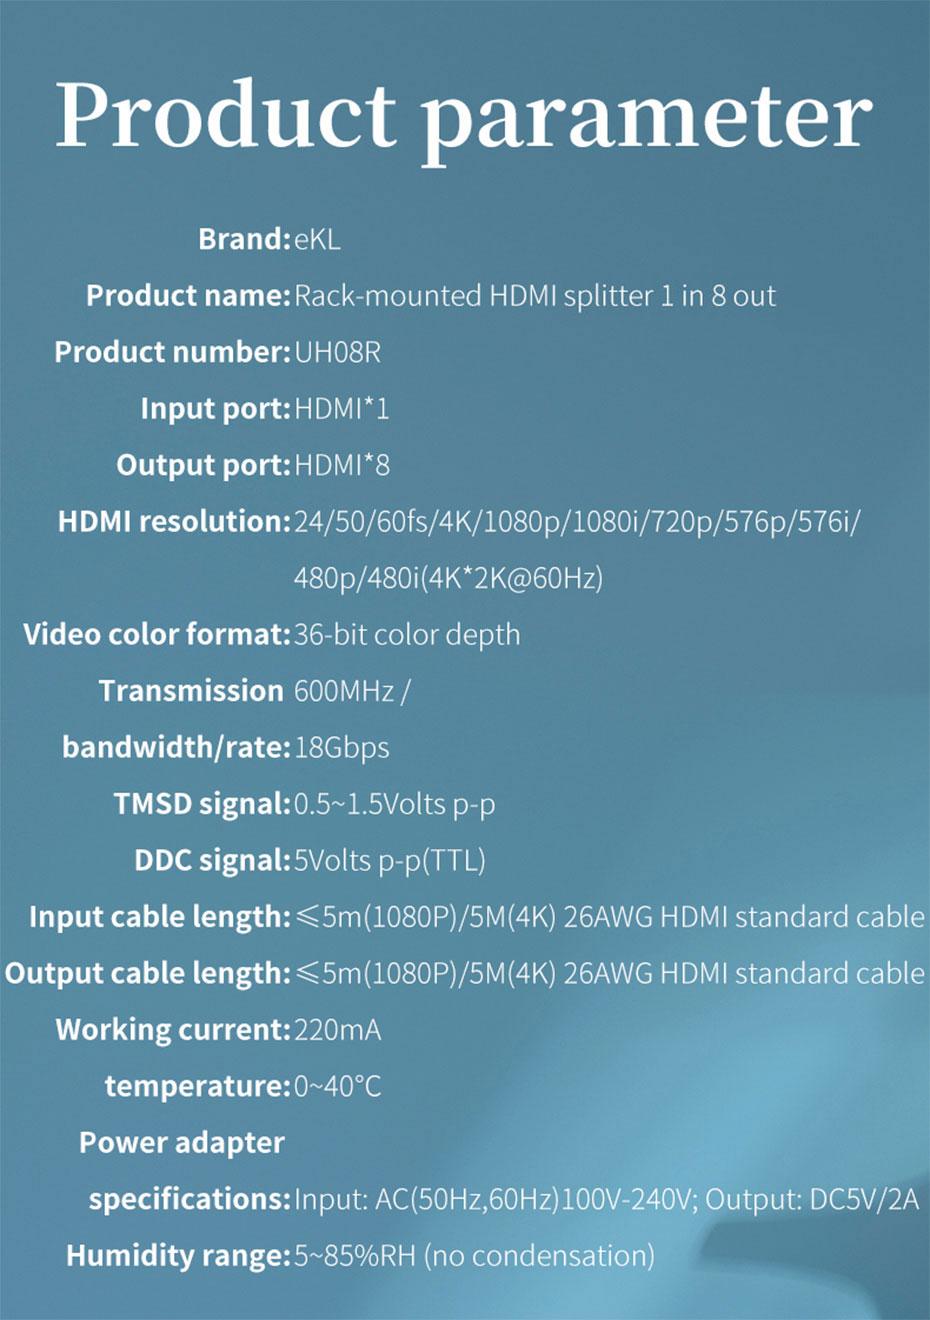 HDMI2.0 splitter 8-port UH08R specifications